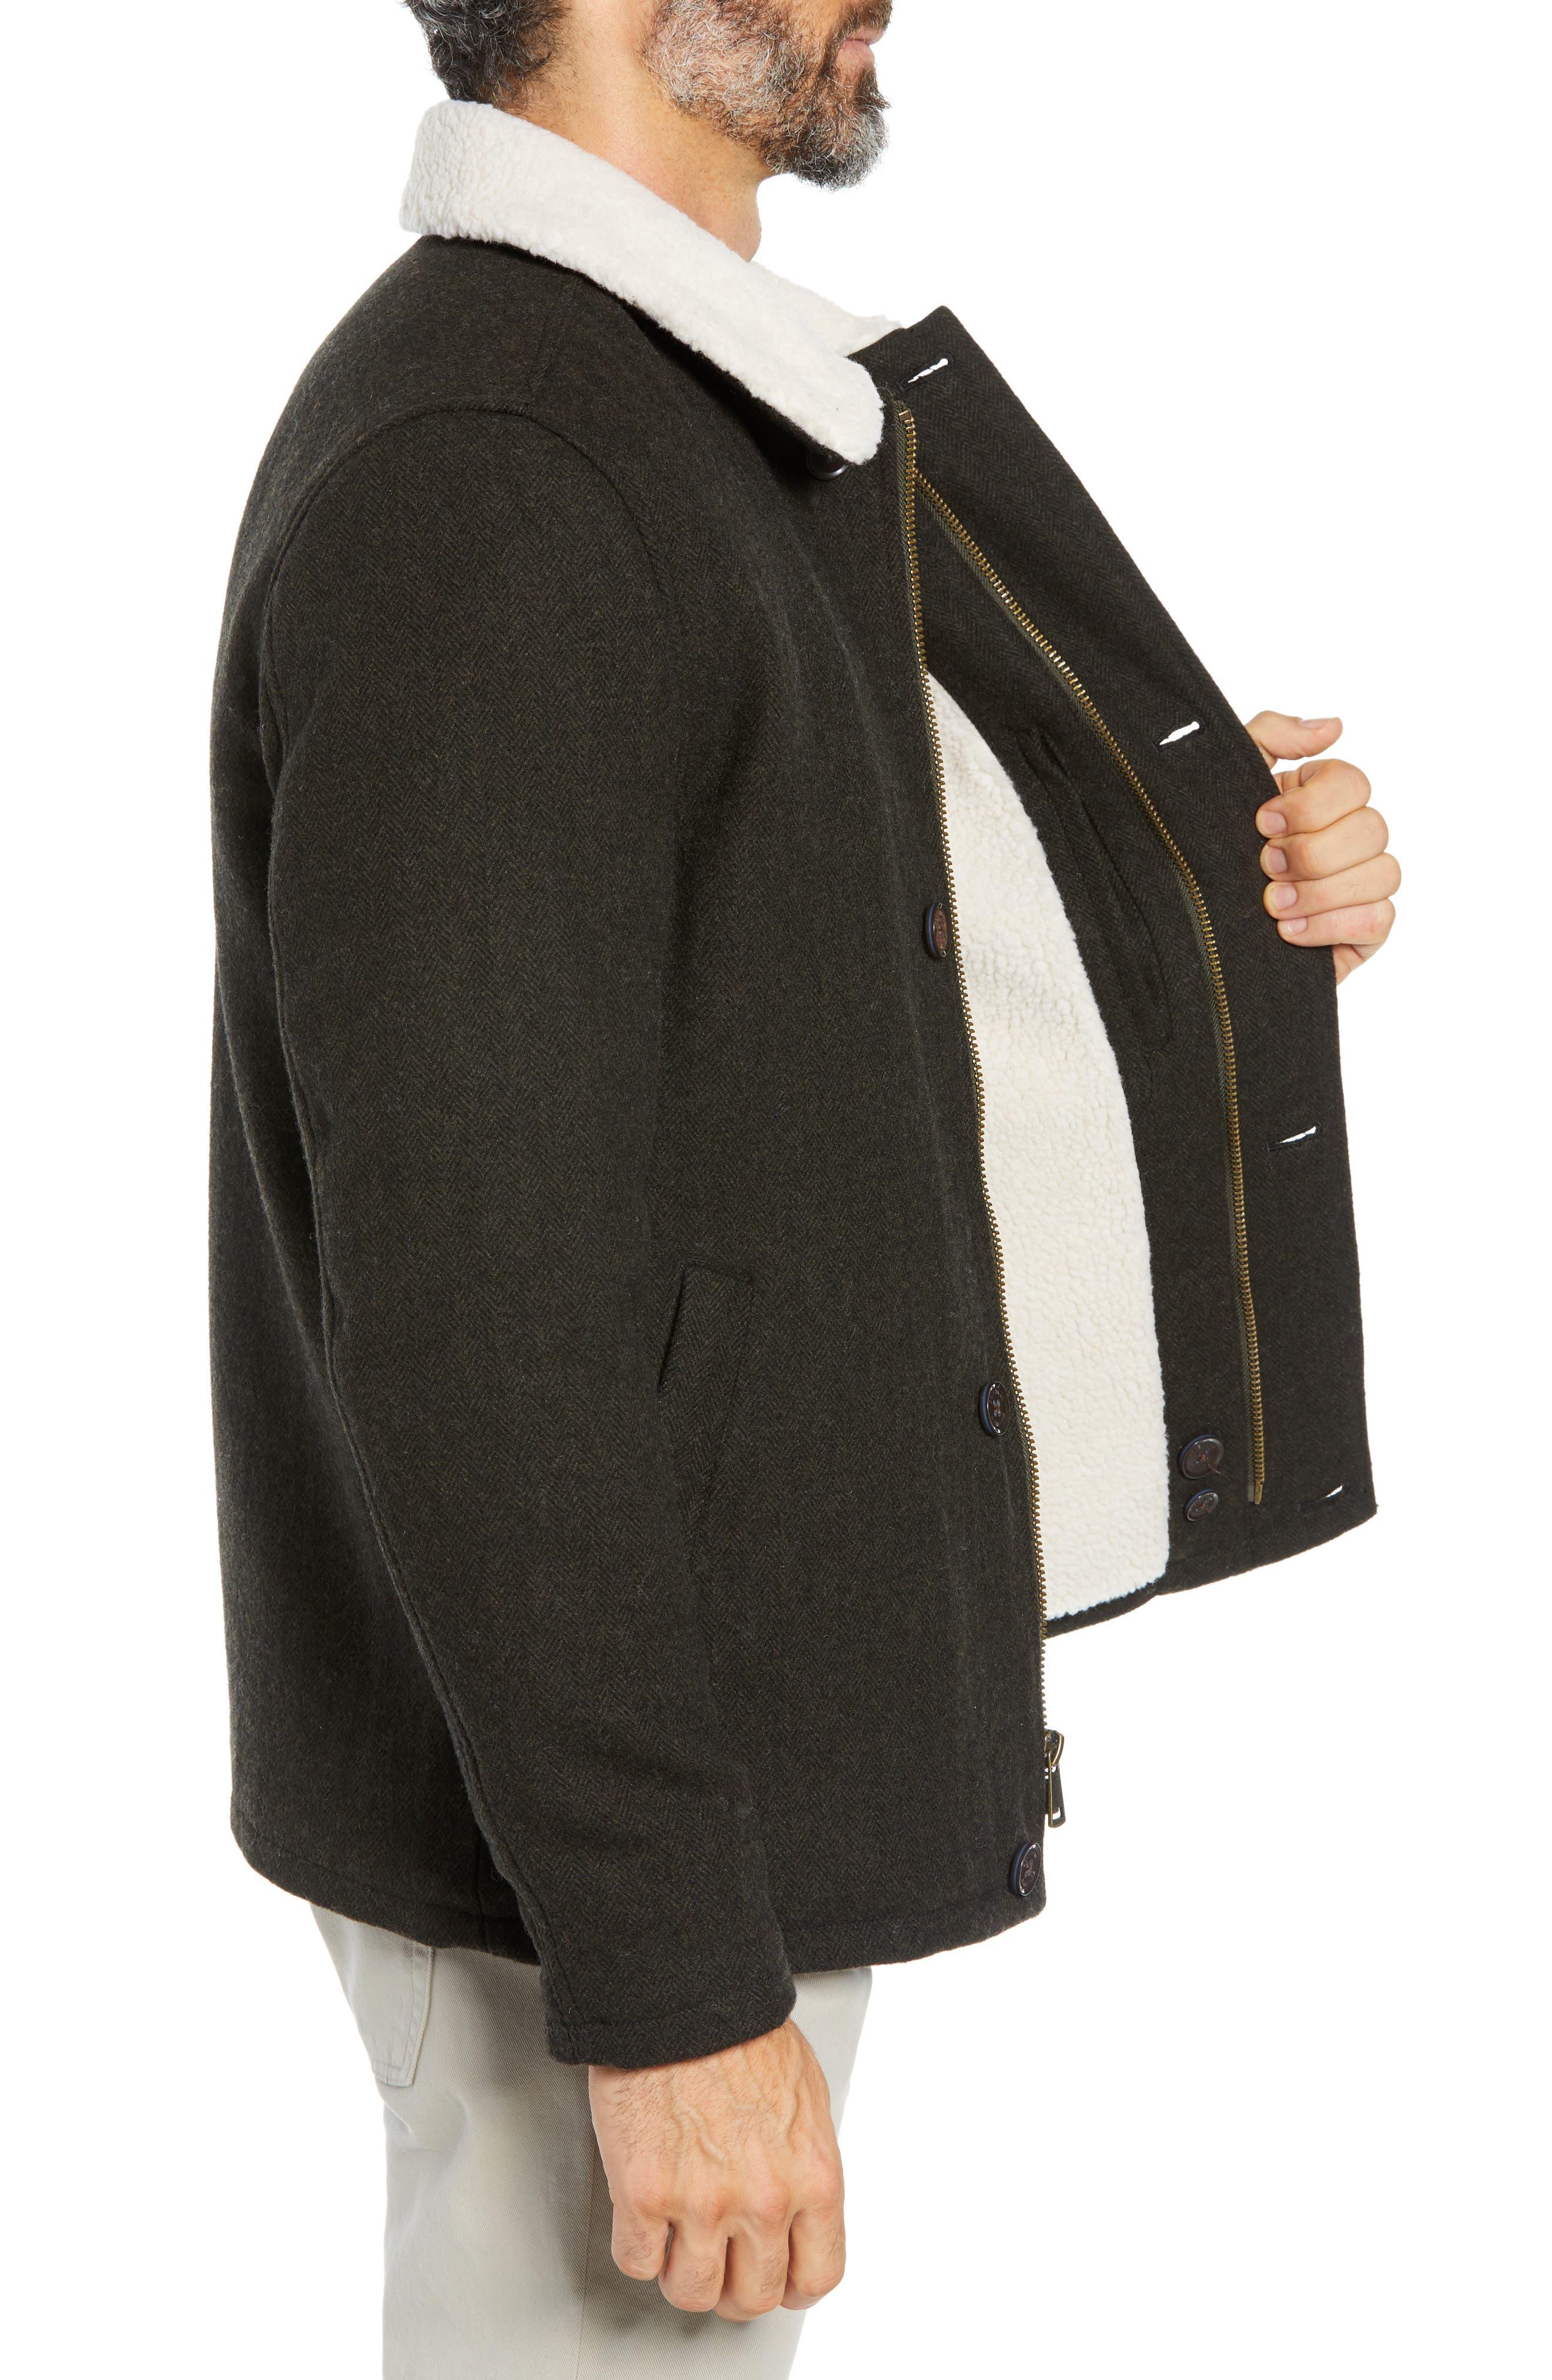 COLE HAAN SIGNATURE,                             Faux Shearling Trim Field Jacket,                             Alternate thumbnail 3, color,                             317